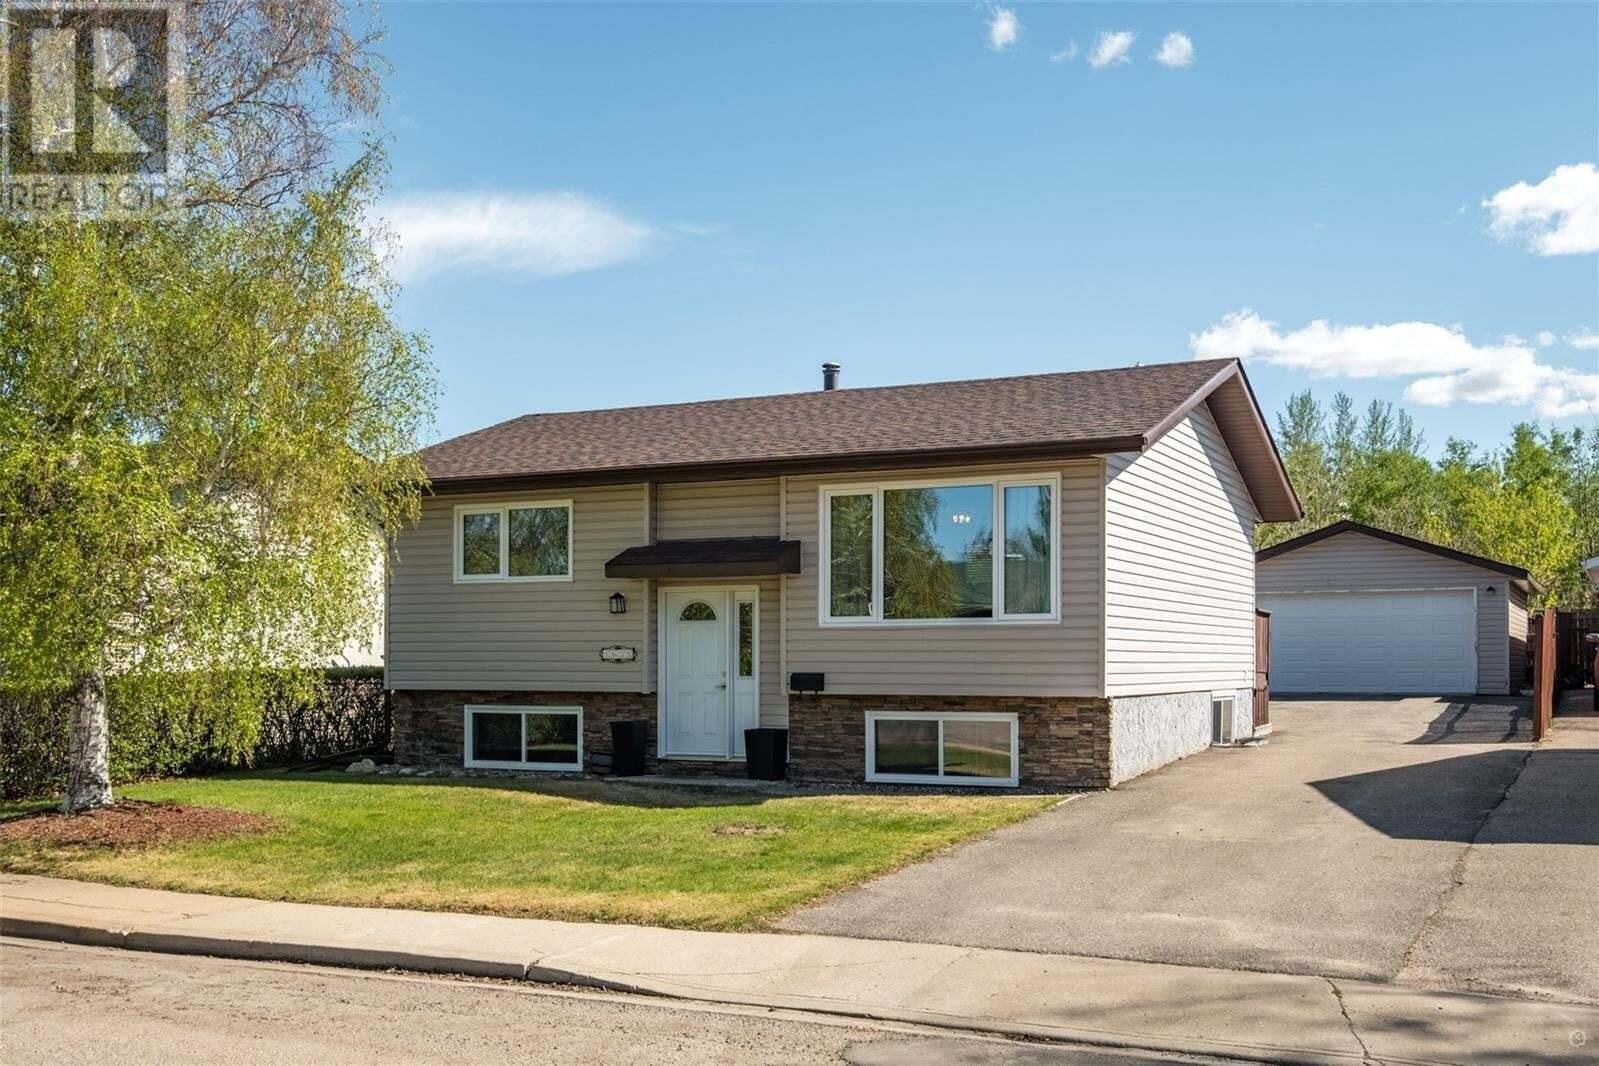 House for sale at 1635 Allbright Cres Prince Albert Saskatchewan - MLS: SK809634